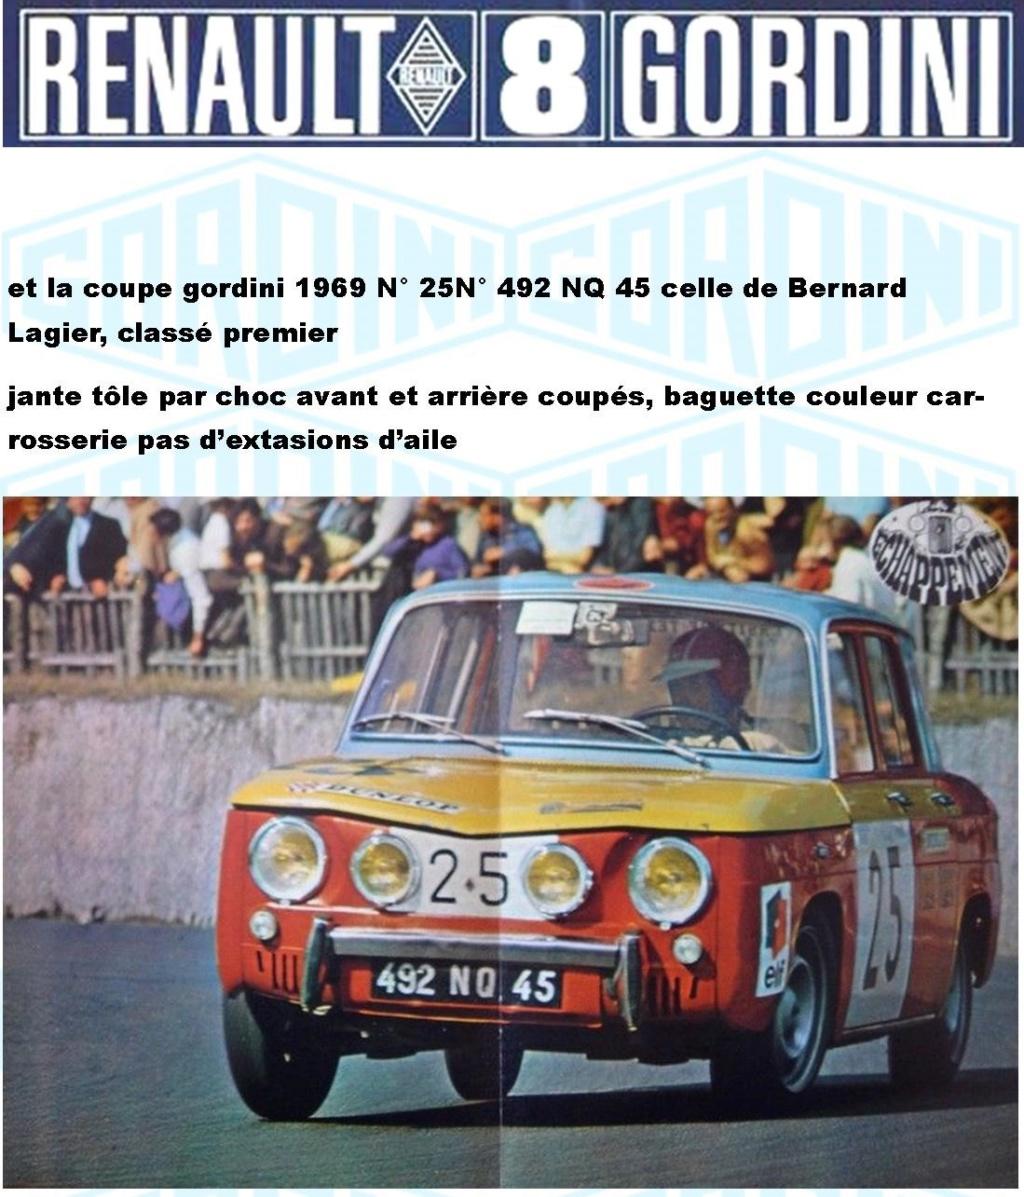 Trois Renault 8 gordini Heller 1/24 Image915